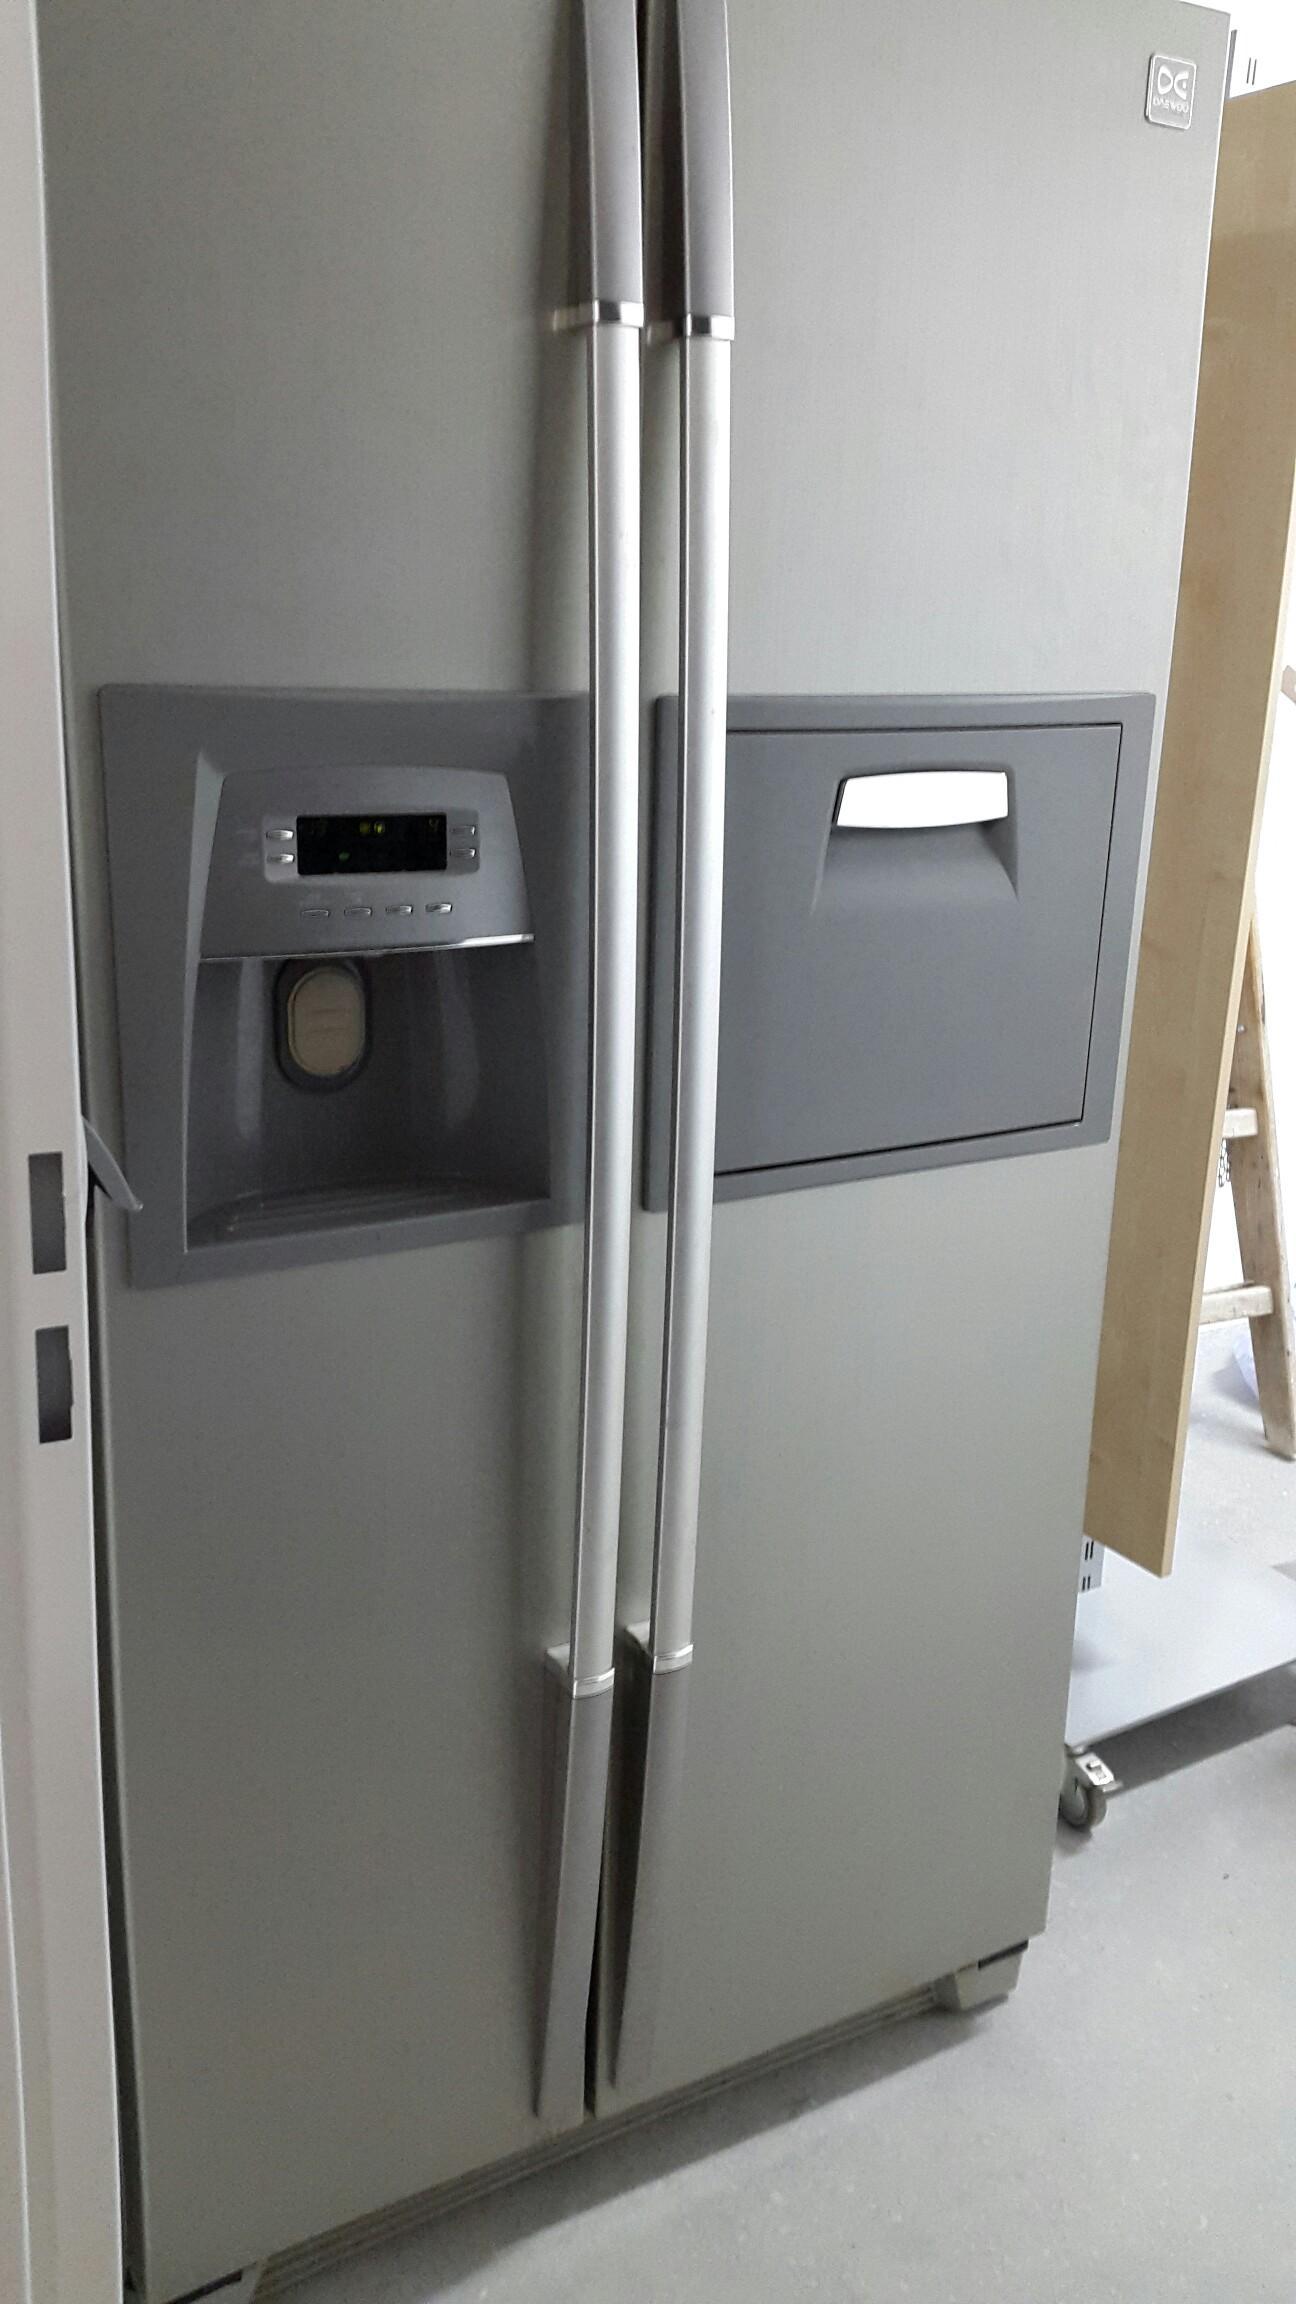 Daewoo Kühlschrank Side By Side : Gebraucht daewoo side by side kühlschrank in imst um u ac